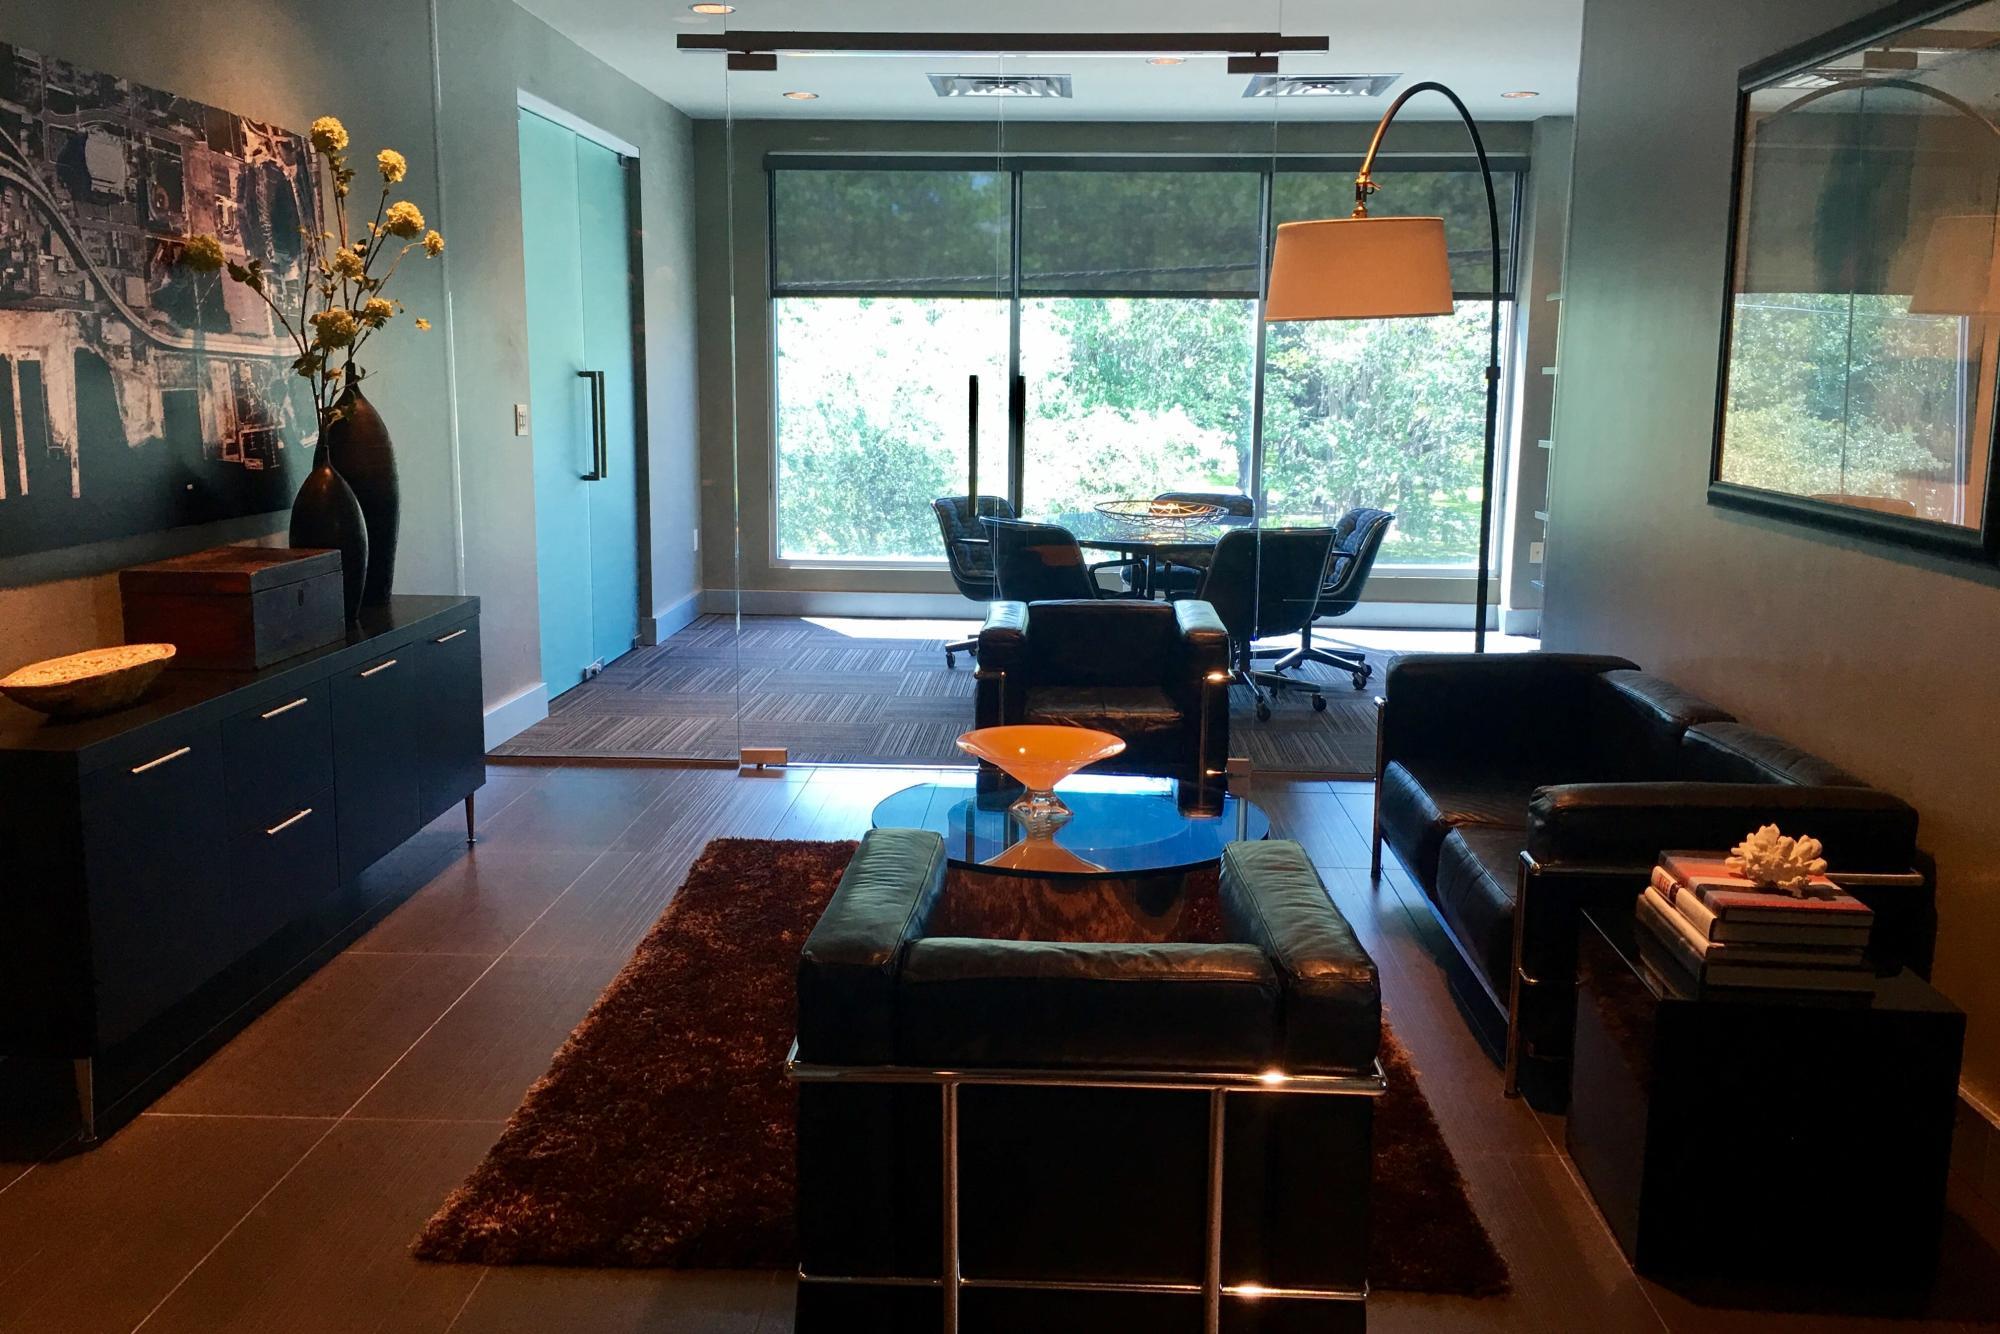 rubin companies in jacksonville real estate development and design